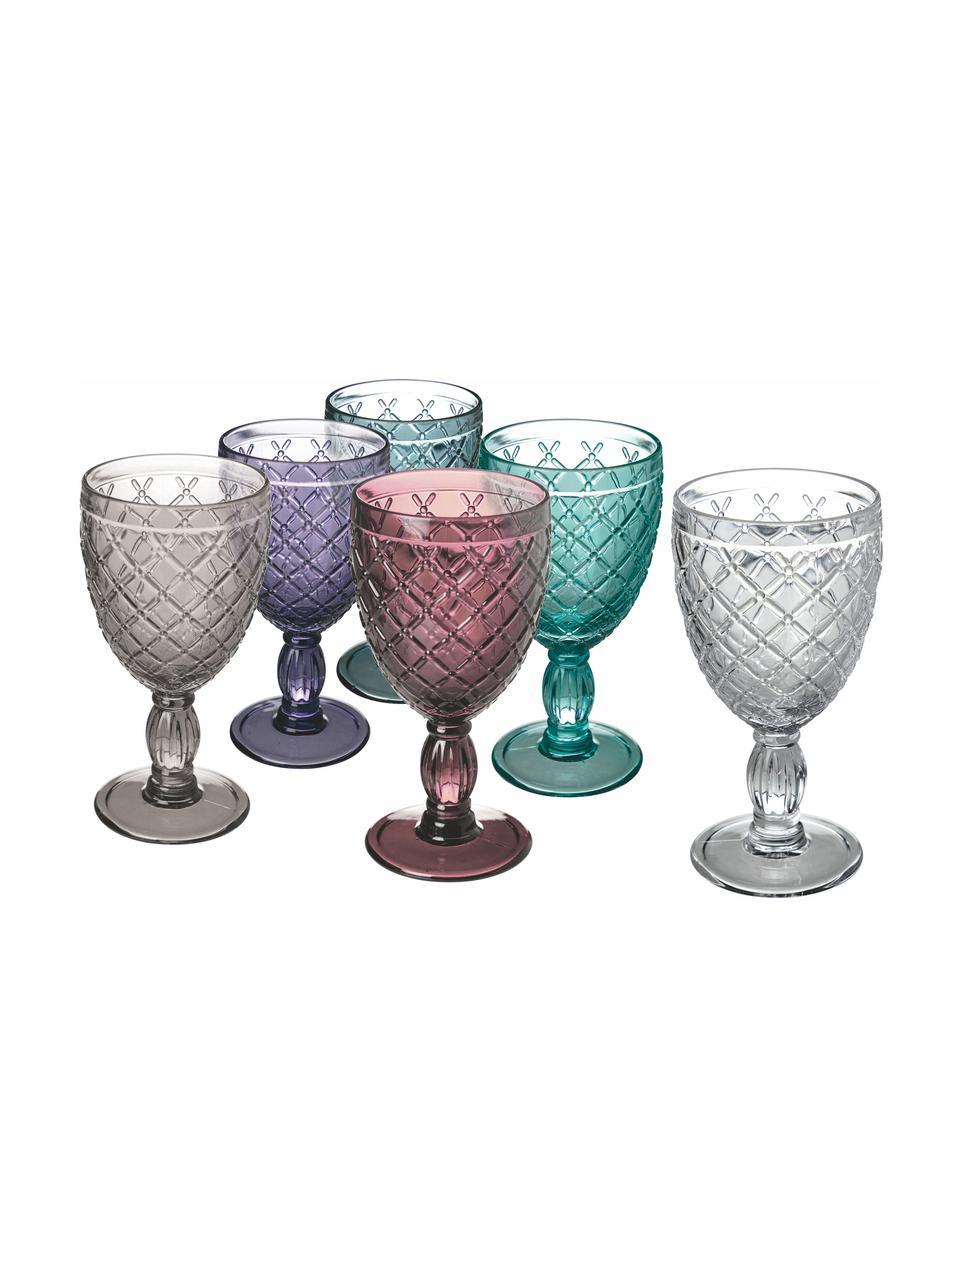 Wijnglazenset Rombi, 6-delig, Glas, Multicolour, Ø 9 x H 17 cm